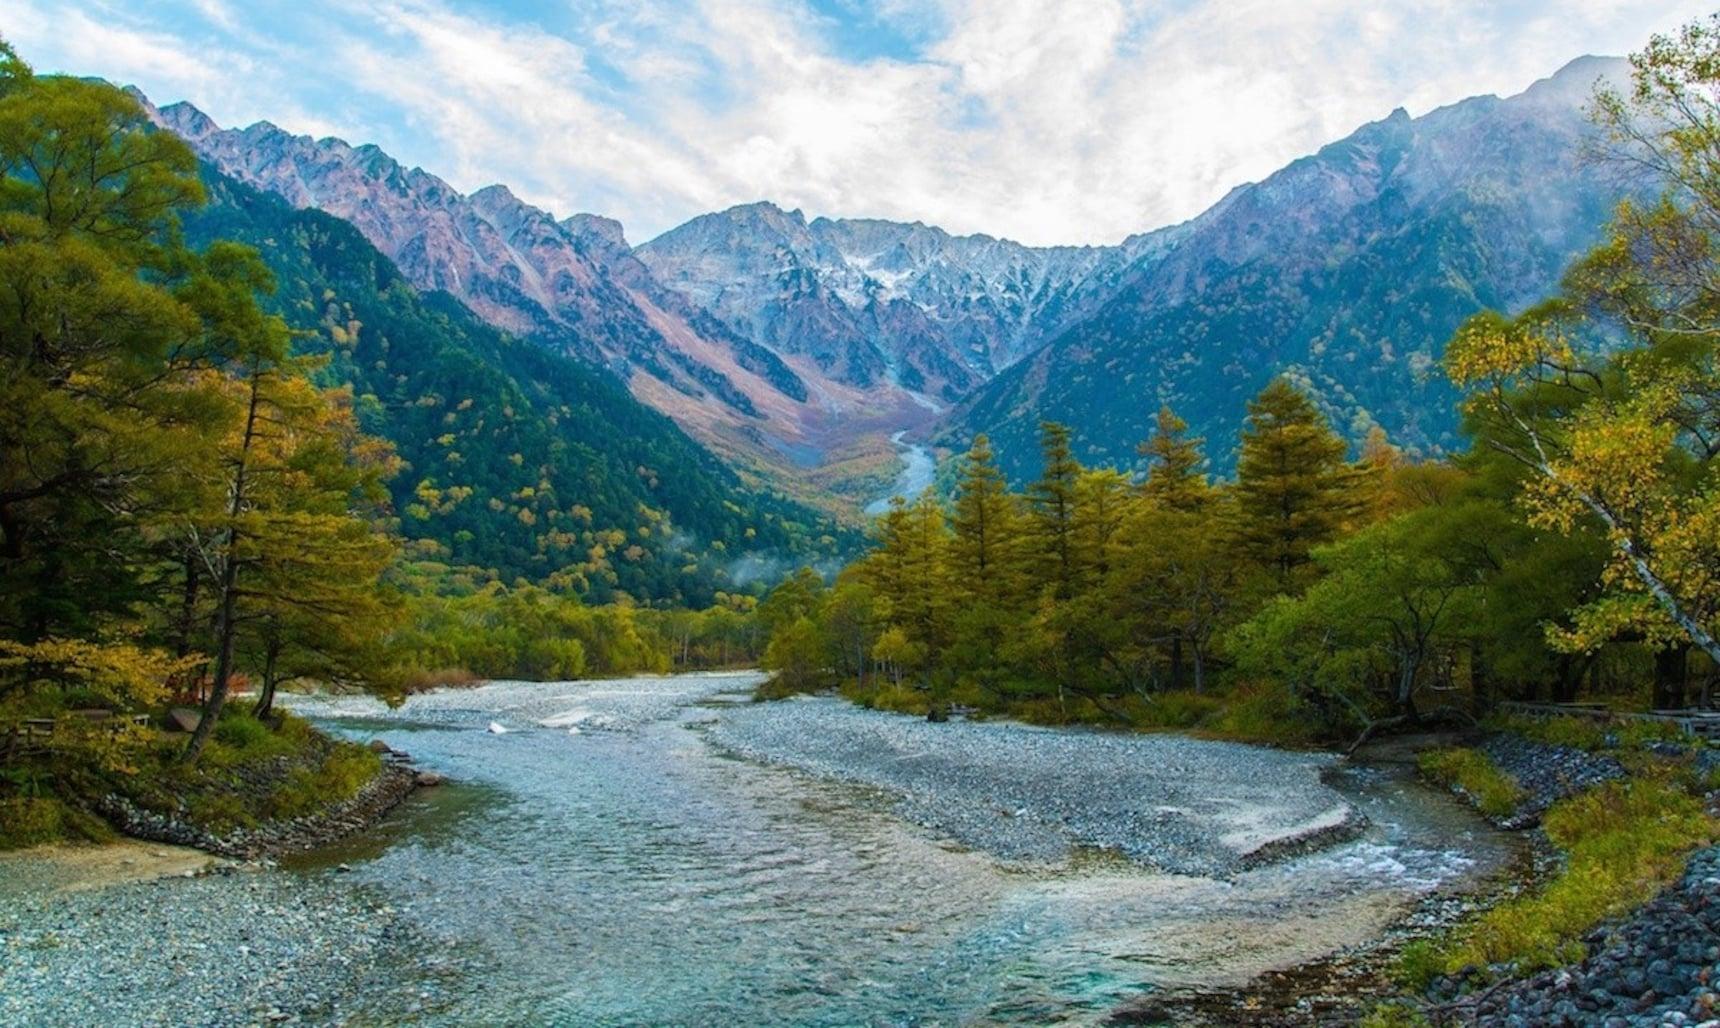 5 Unbelievable Hiking Spots in the Japan Alps